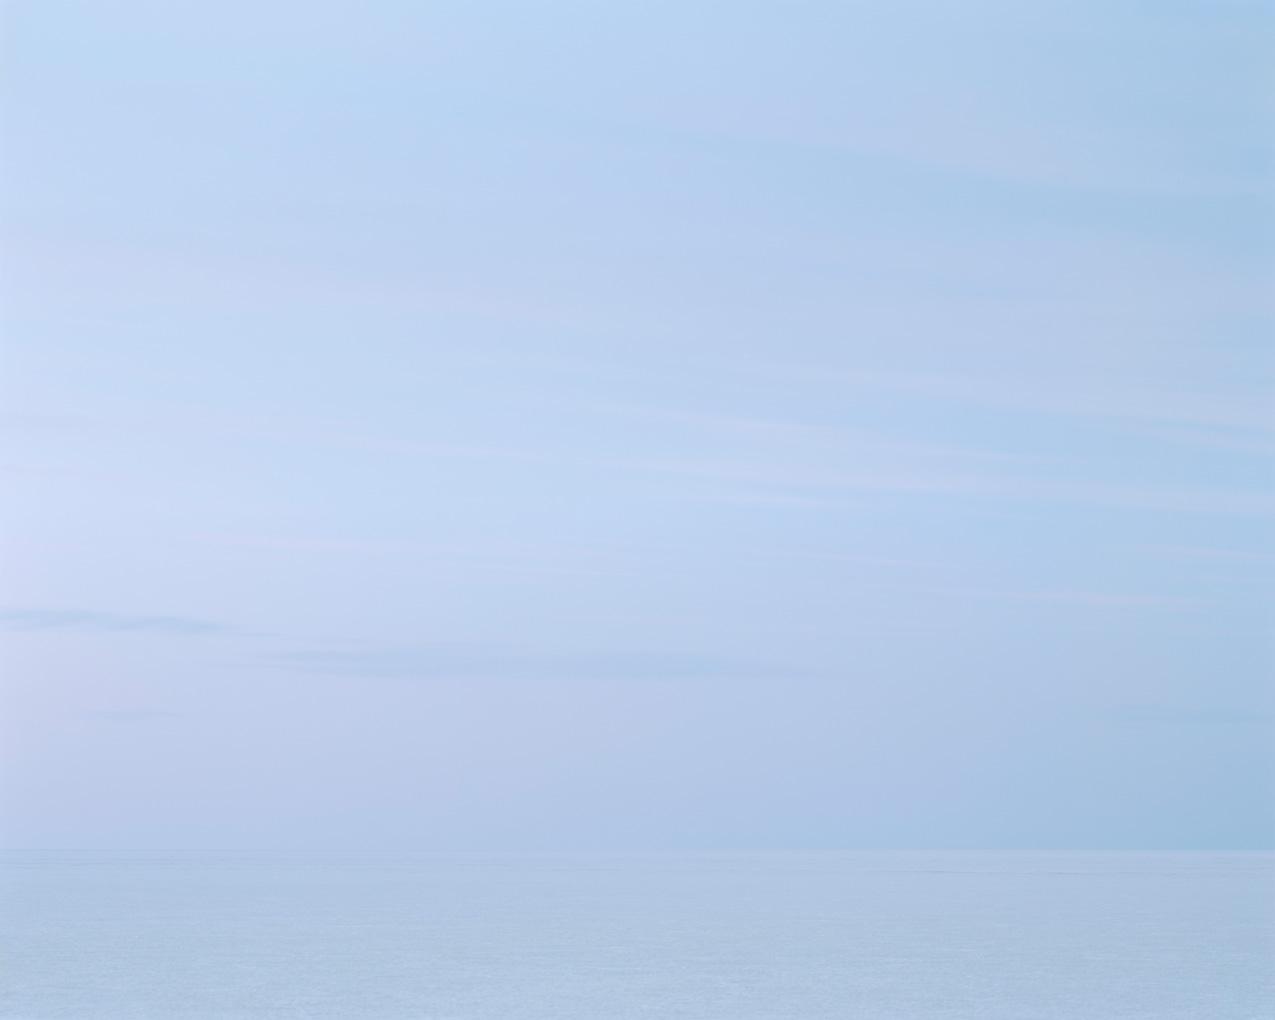 Salt 70, 120cm x 150cm, digital pigment print on cotton rag, edition of 7, 2005